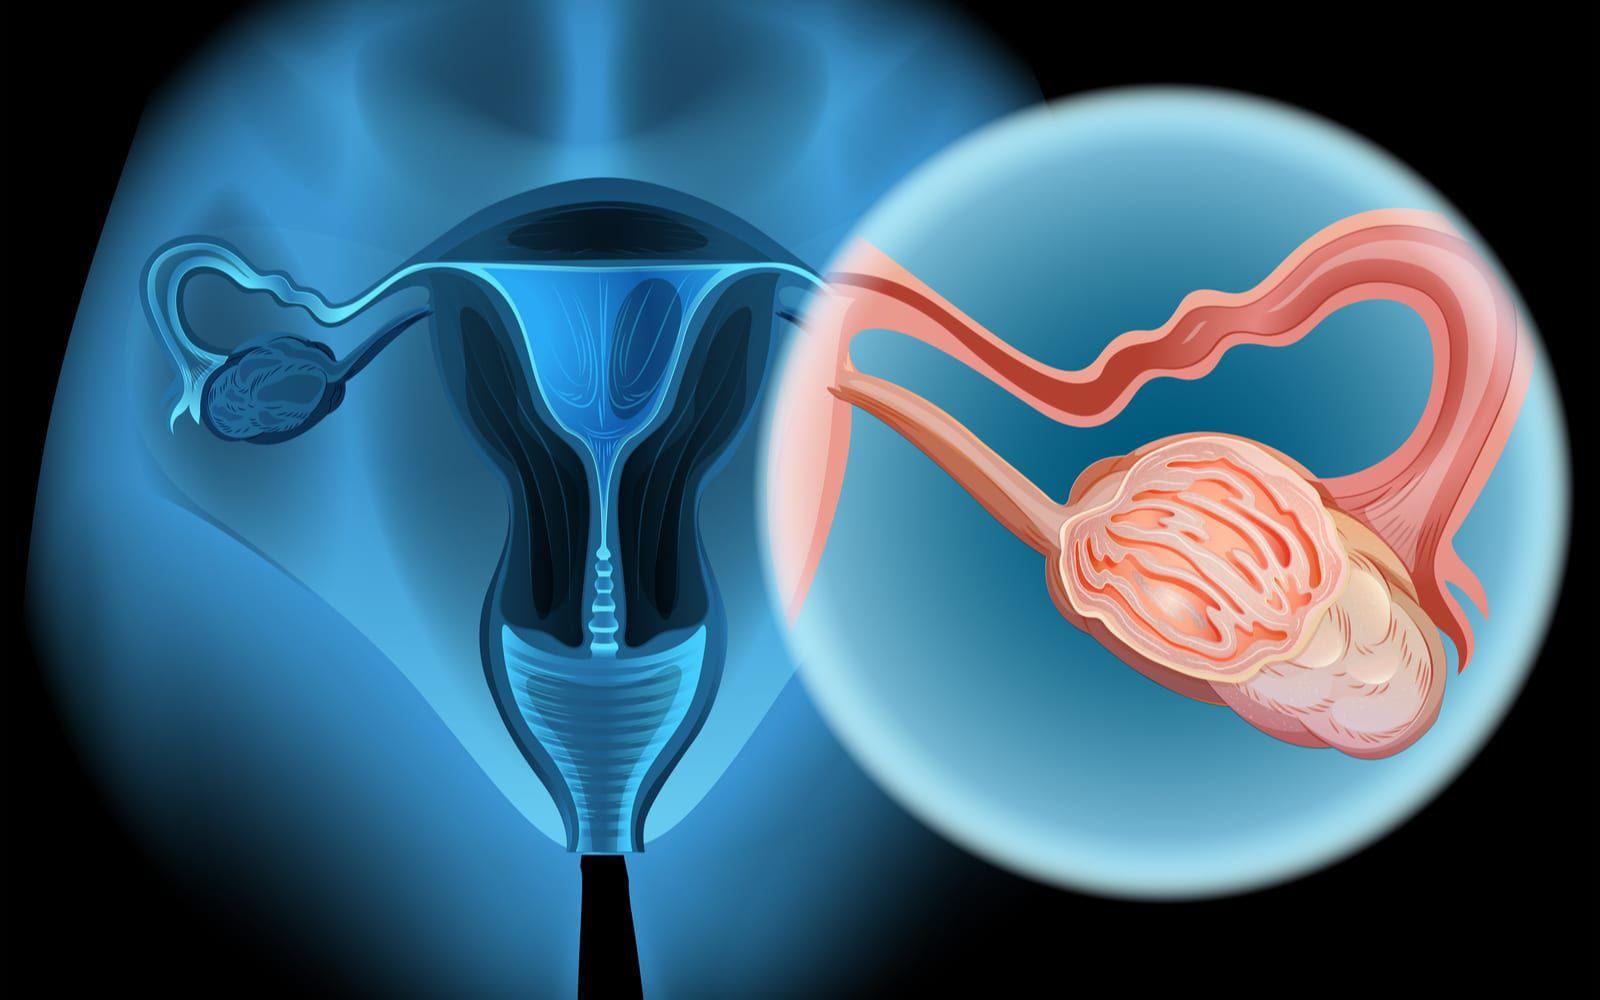 Ovarian Cancer Image